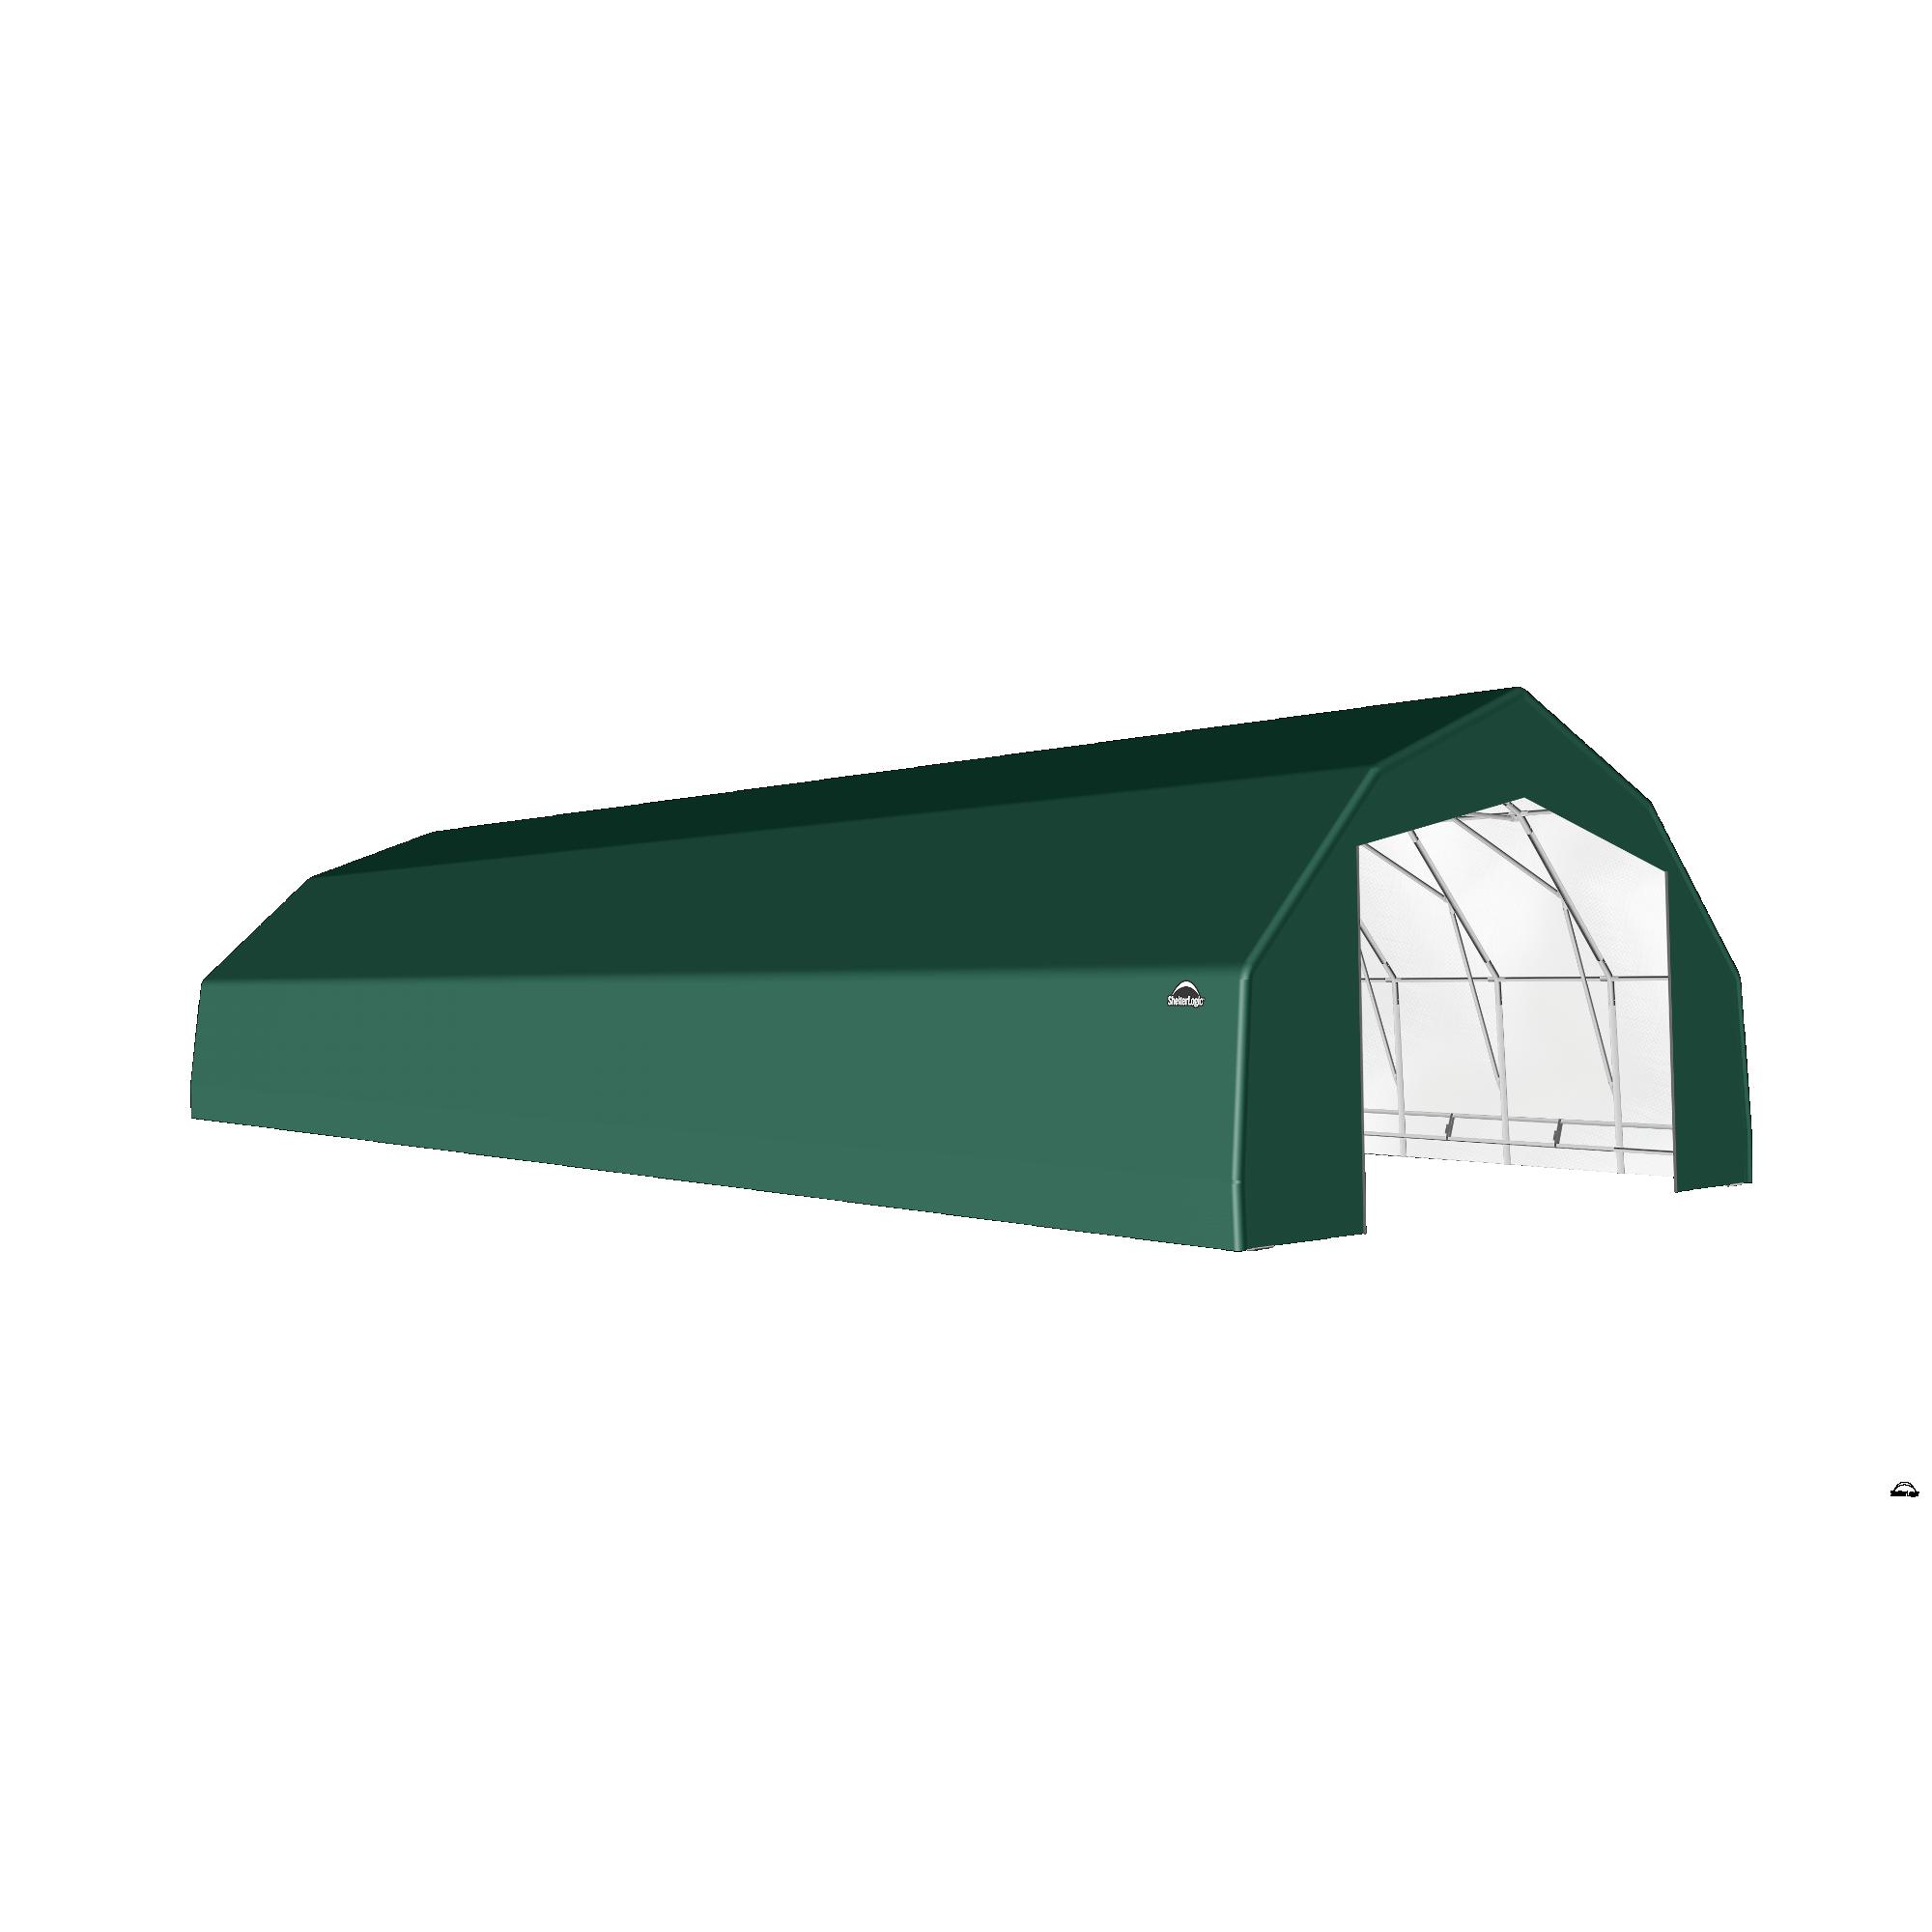 SP Barn 25X52X14 Green 14 oz PE Shelter